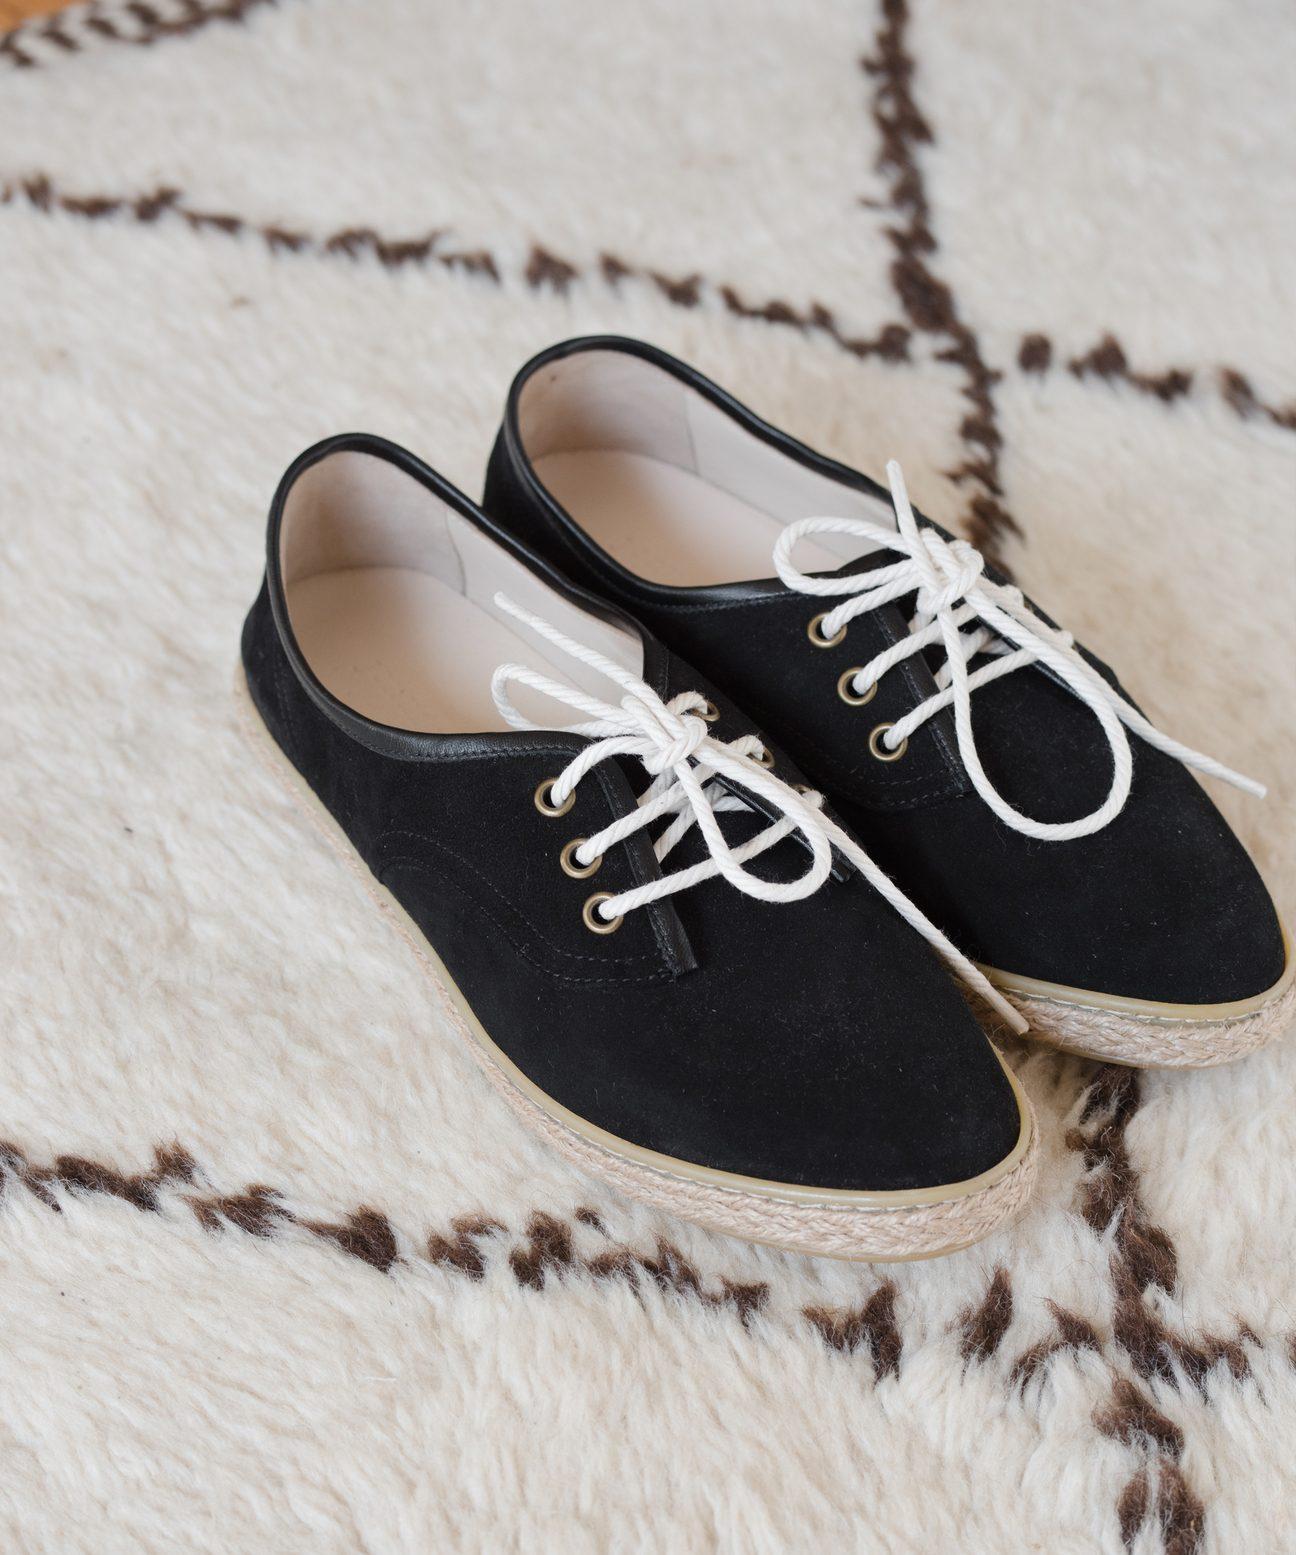 Suede Marina Espadrille Sneaker - Black